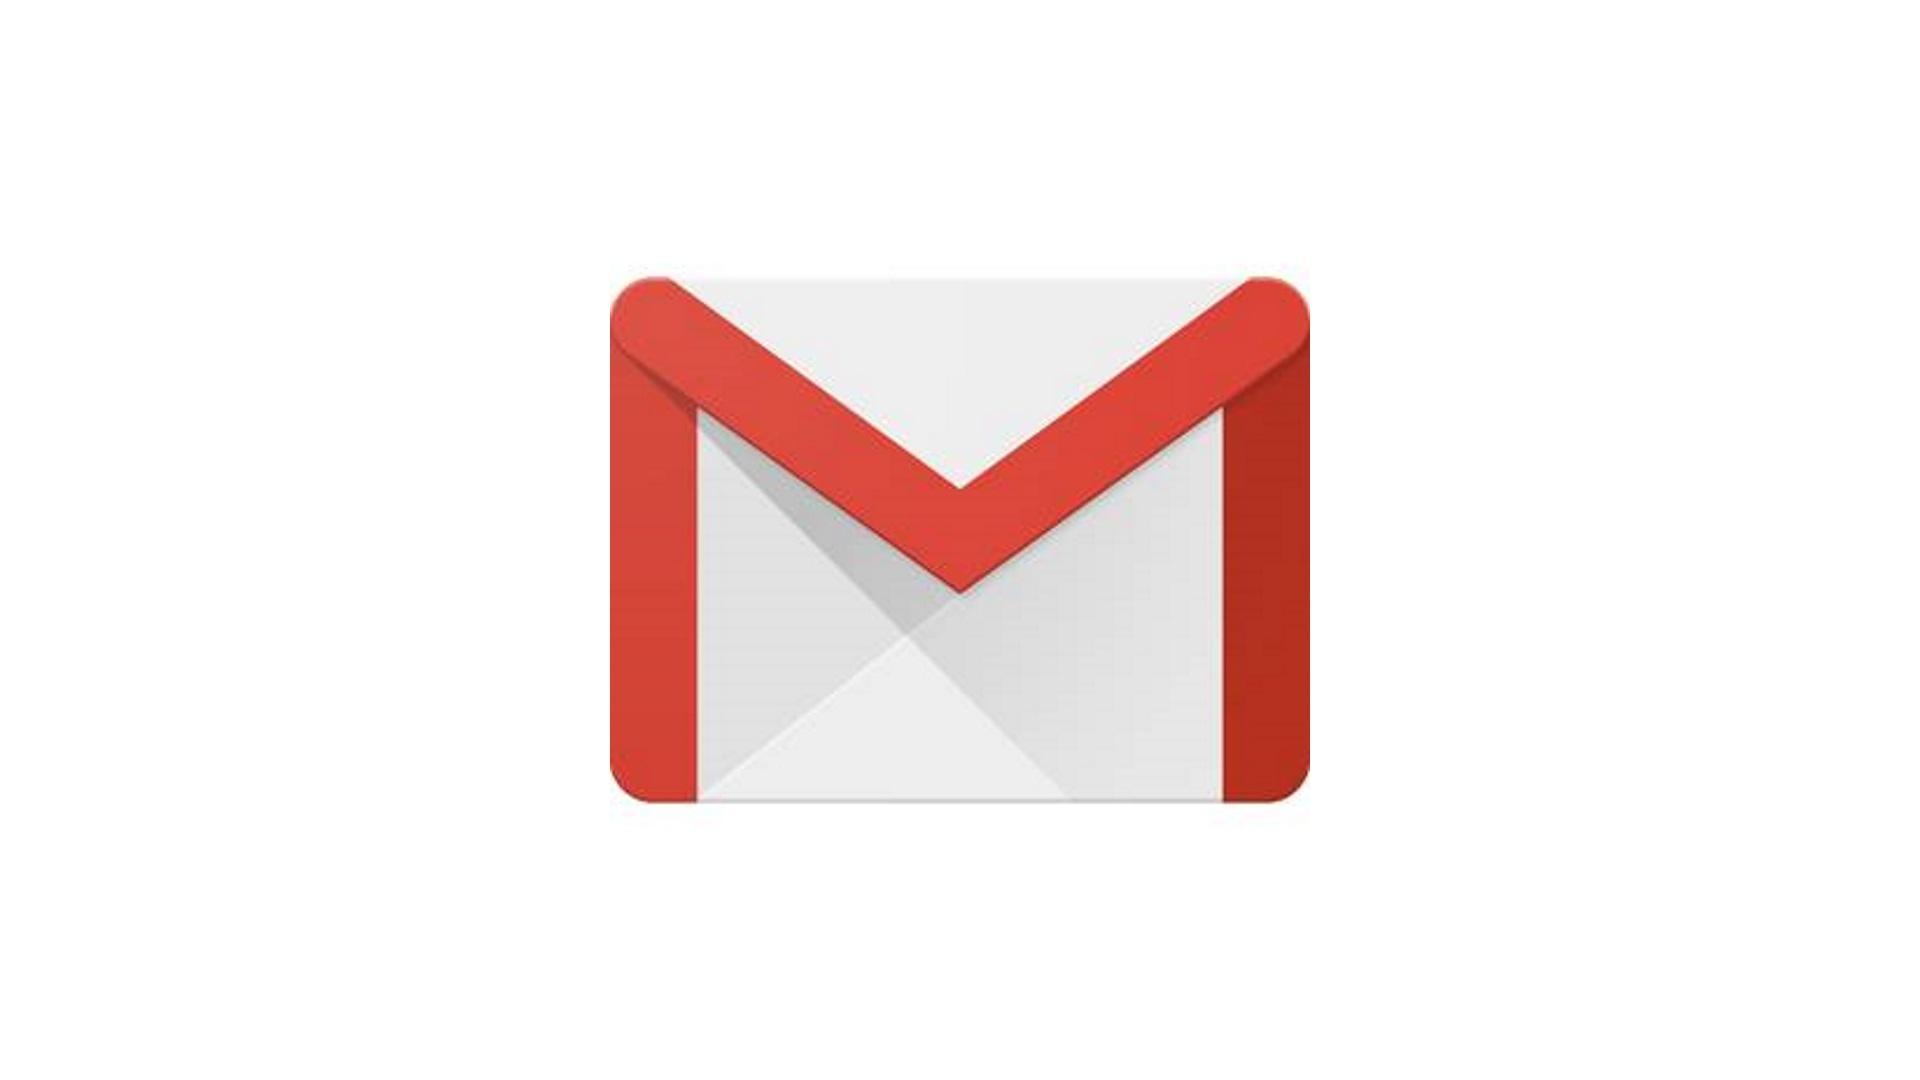 Android版「Gmail」v7.8でアーカイブ直後の取り消しが可能に